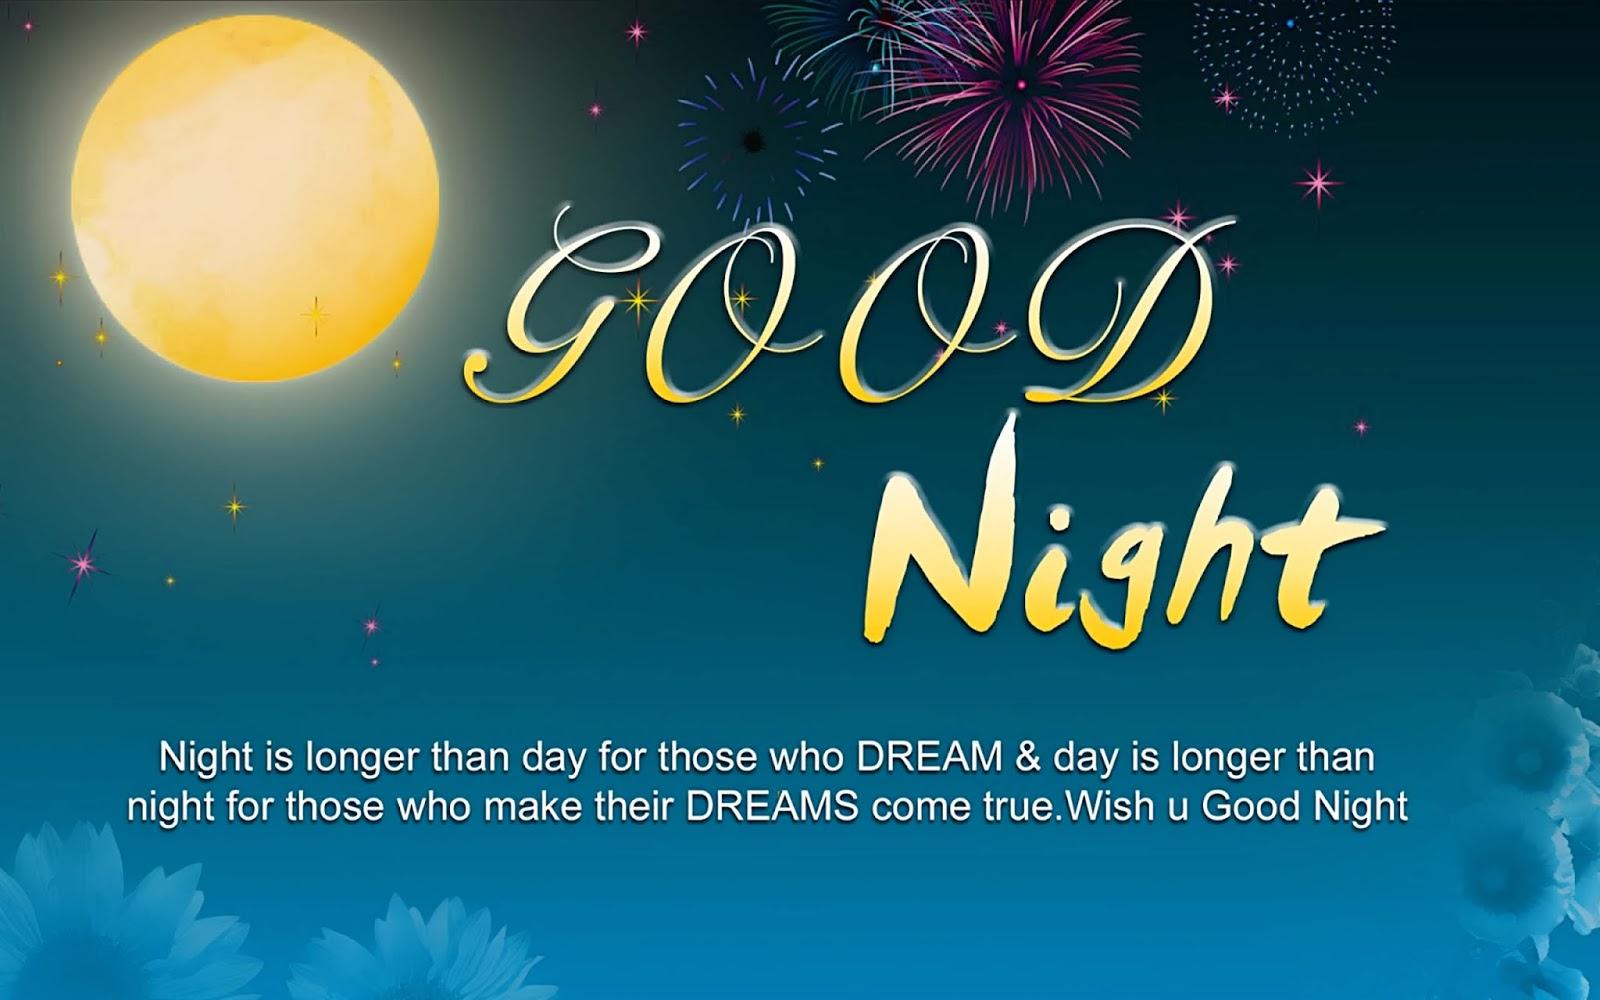 Good-Night-Walpaper-For-Wishing-Image-HD-Wide